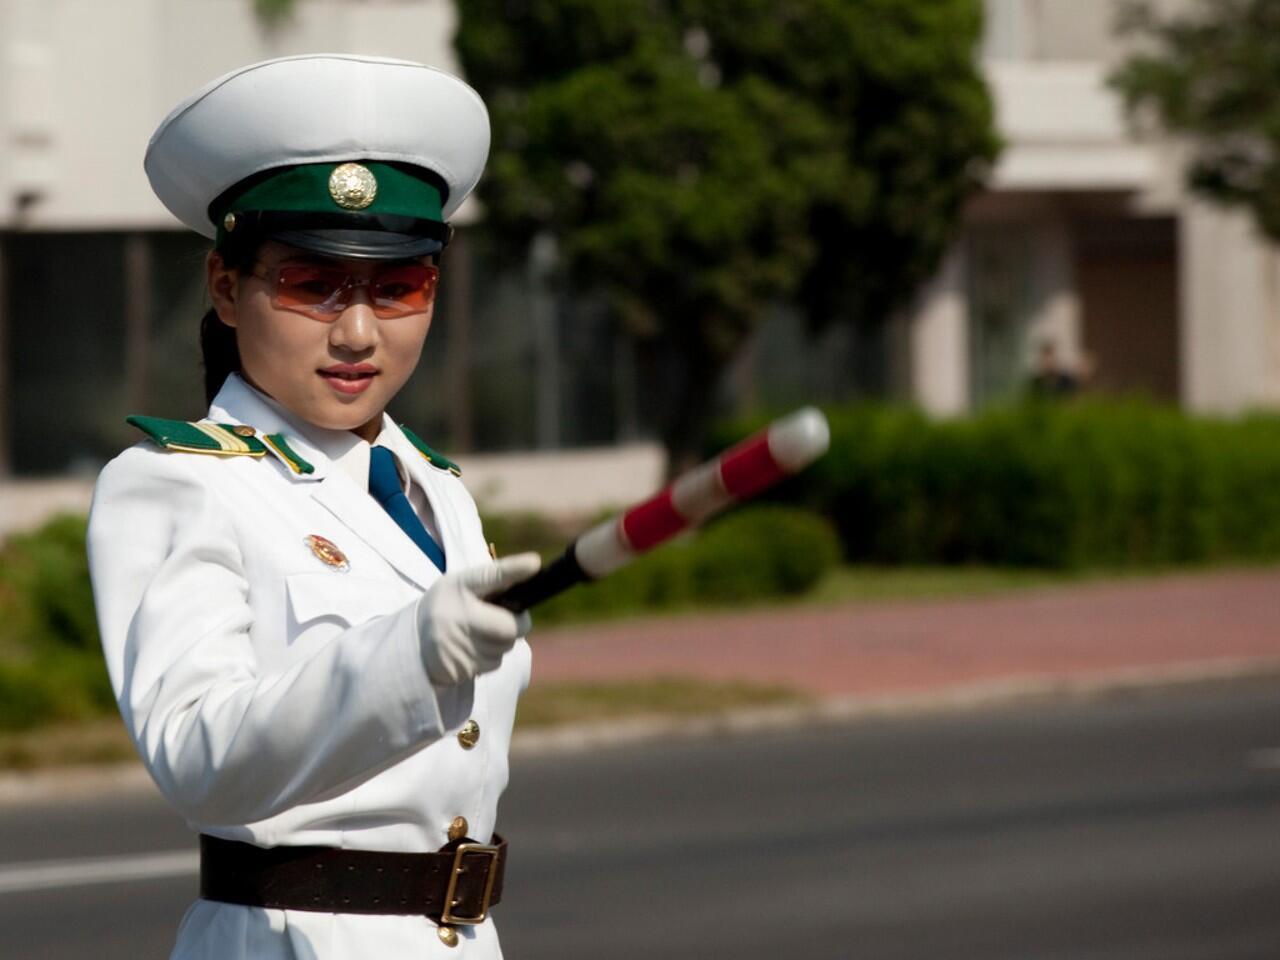 trit tandingan Hot trit wajah palsu korea, ini baru wajah asli korea bening detected